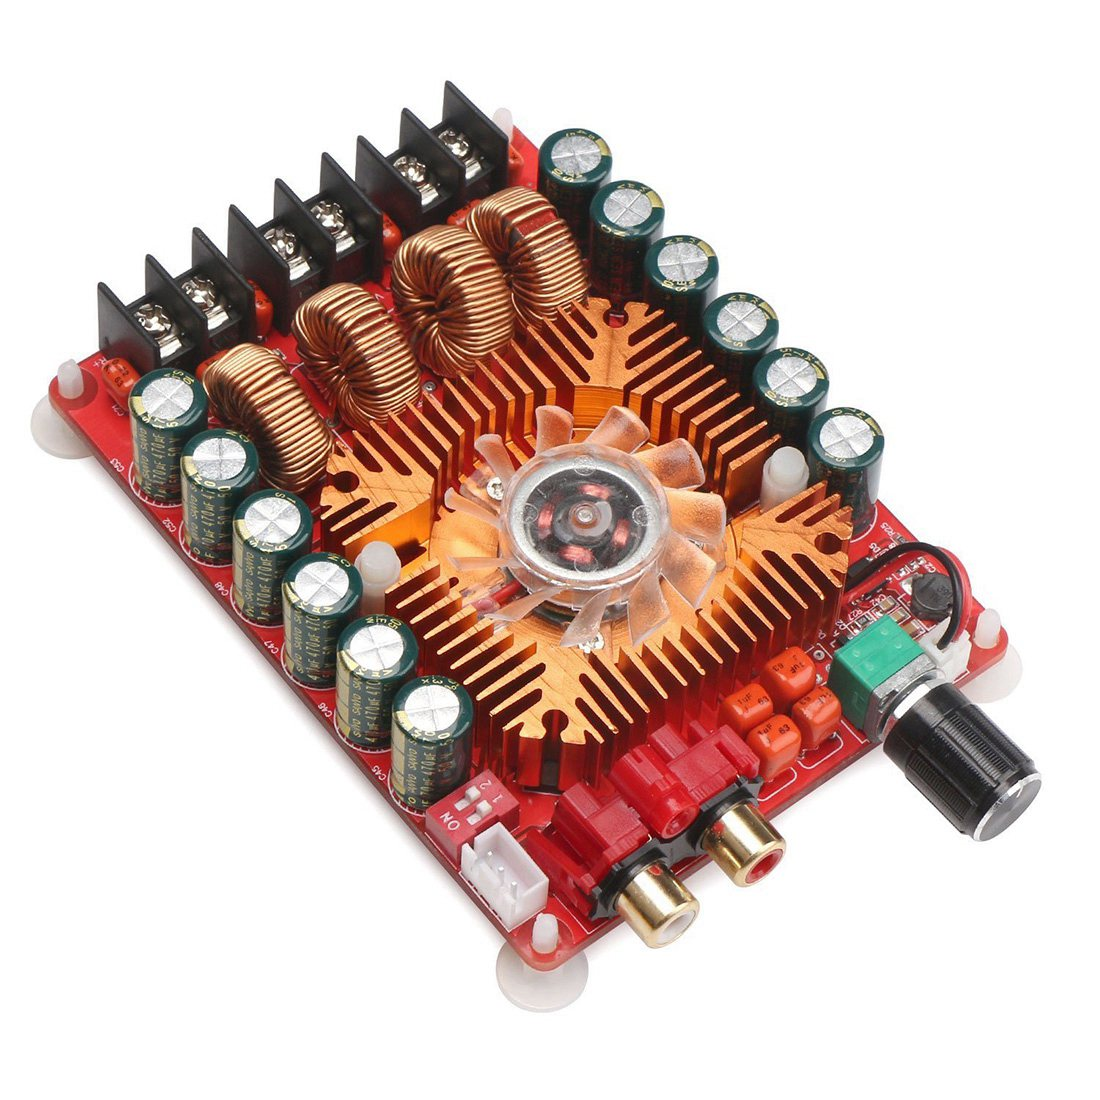 TDA7498E 2X160 watt Dual Kanal Audio Verstärker Bord, unterstützung BTL Modus 1X220 watt Einzigen Kanal, DC 24 v Digital Stereo Power Amp